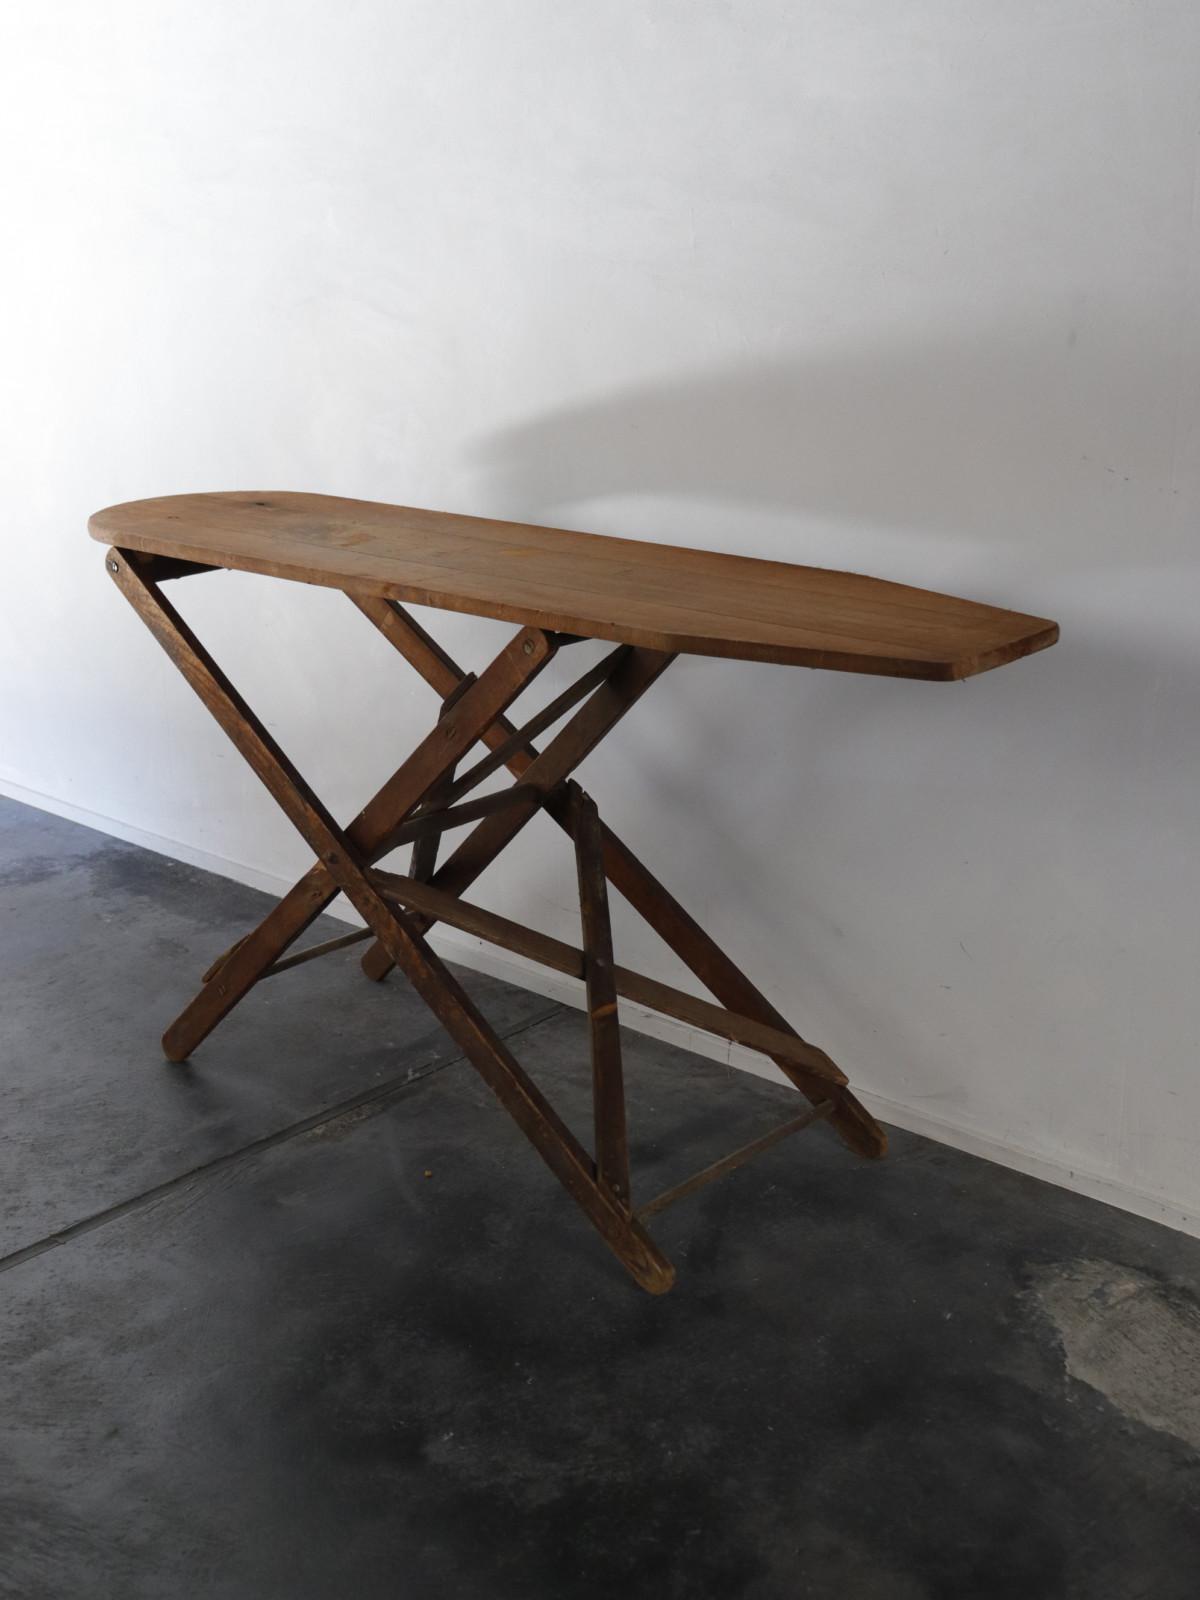 1920's,ironing board, USA,Vintage